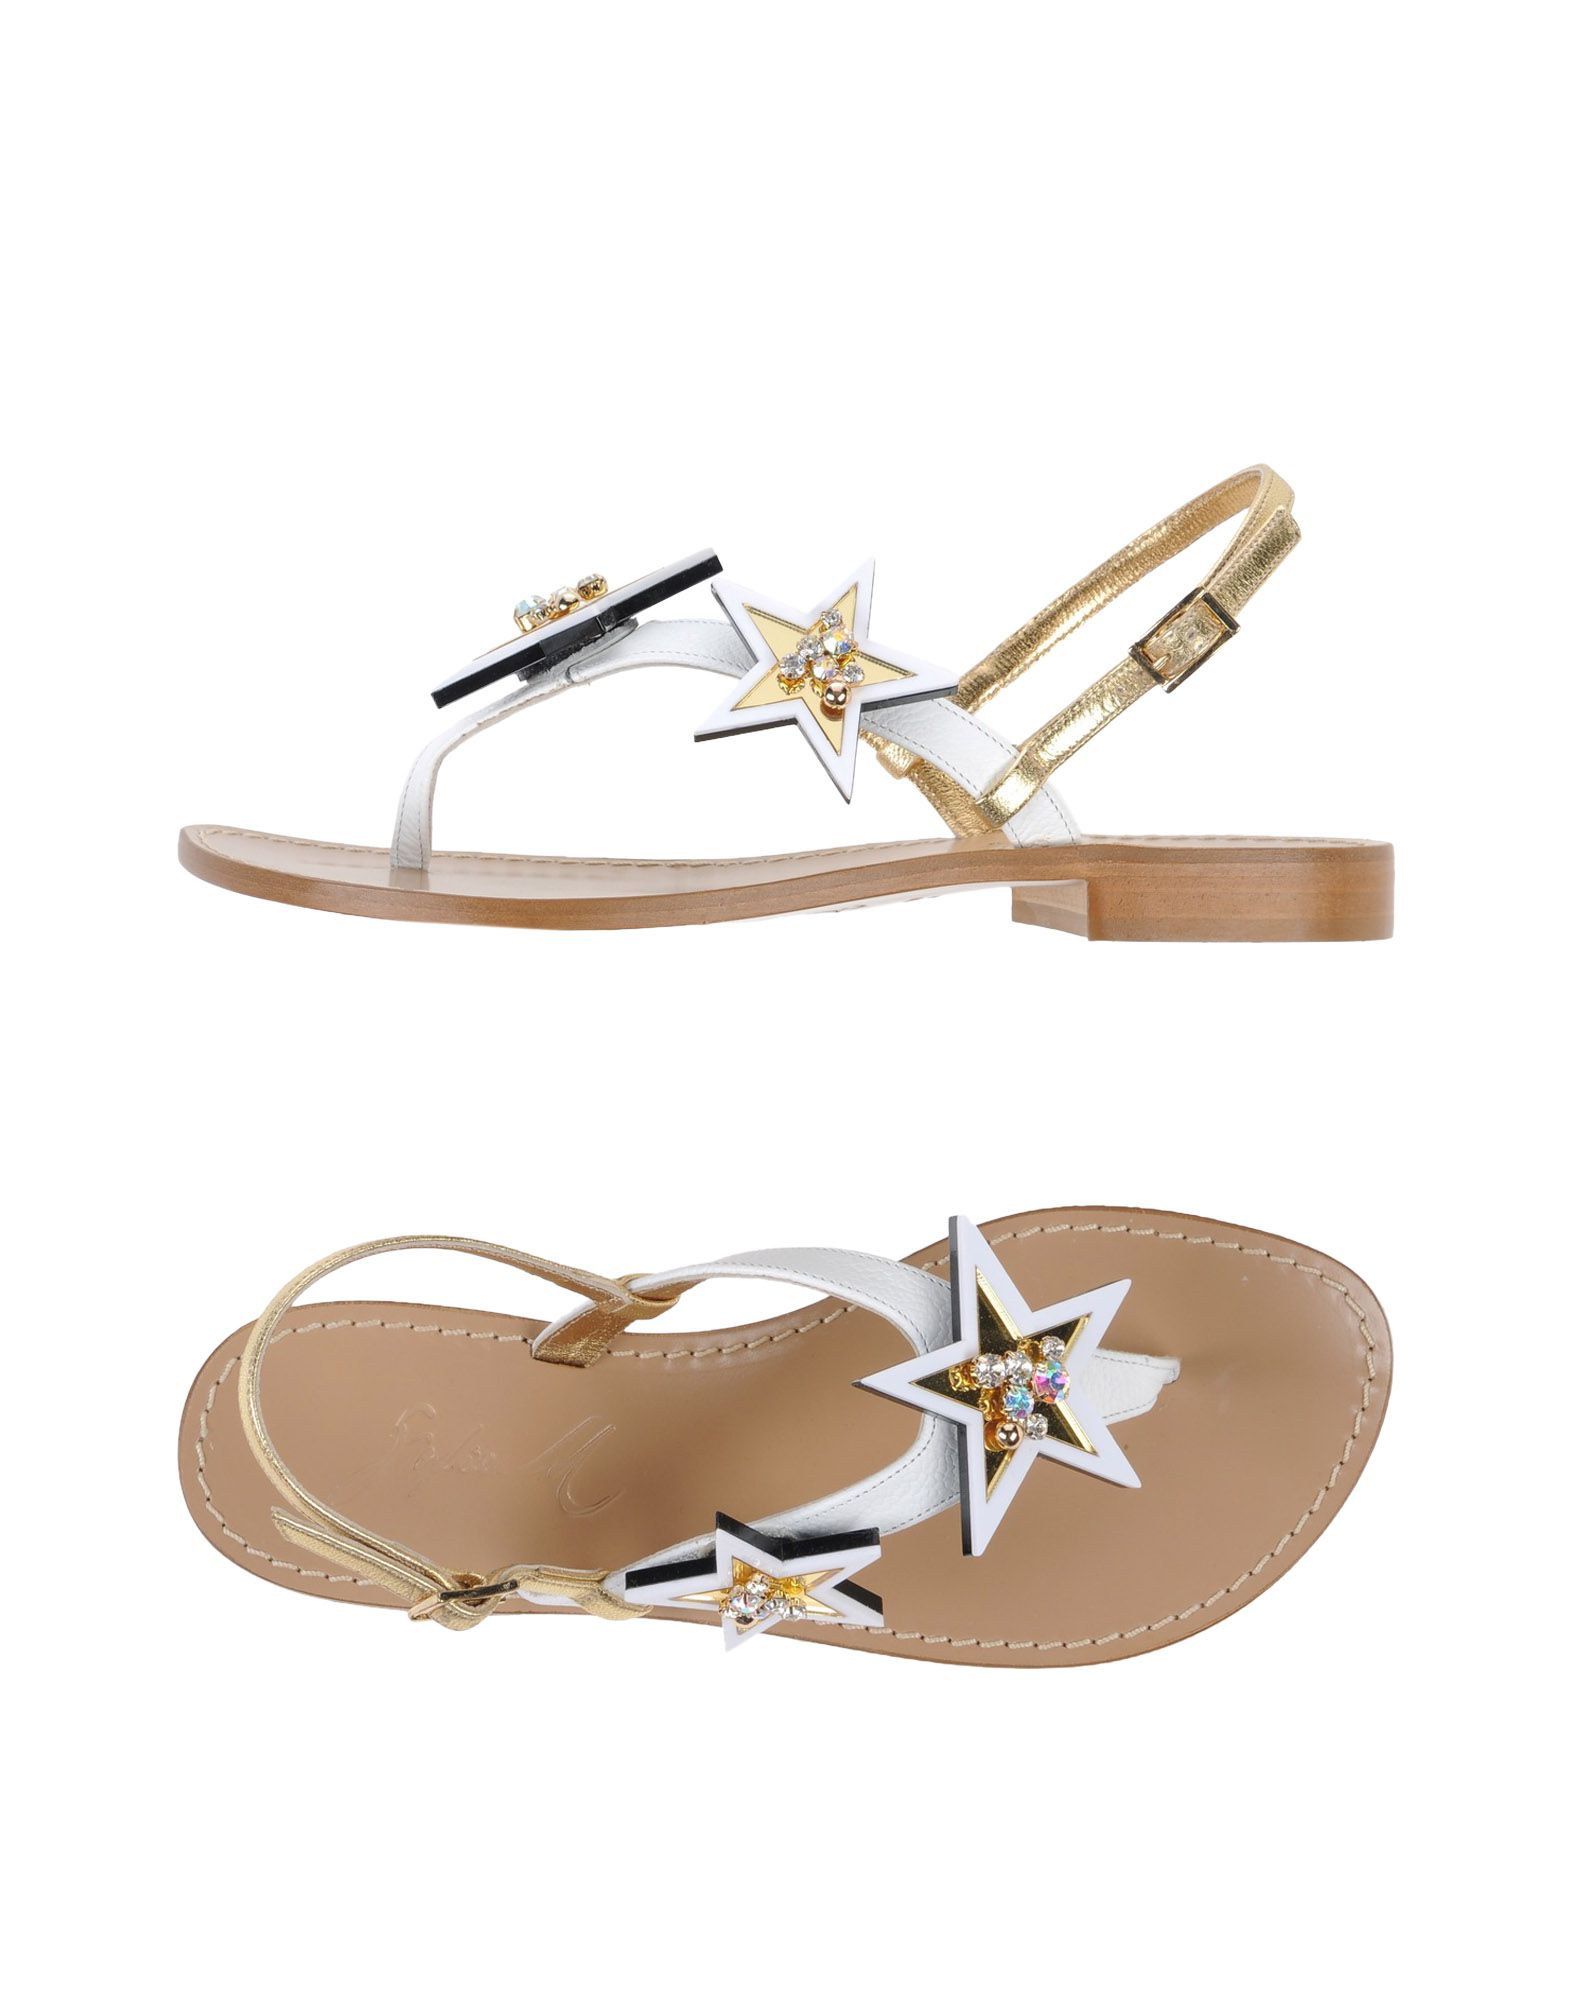 38 EU (5 UK)  Bottes Femme SOFIA M. Tongs femme. Gabor Shoes Gabor Fashion  37 EU eMtwZ